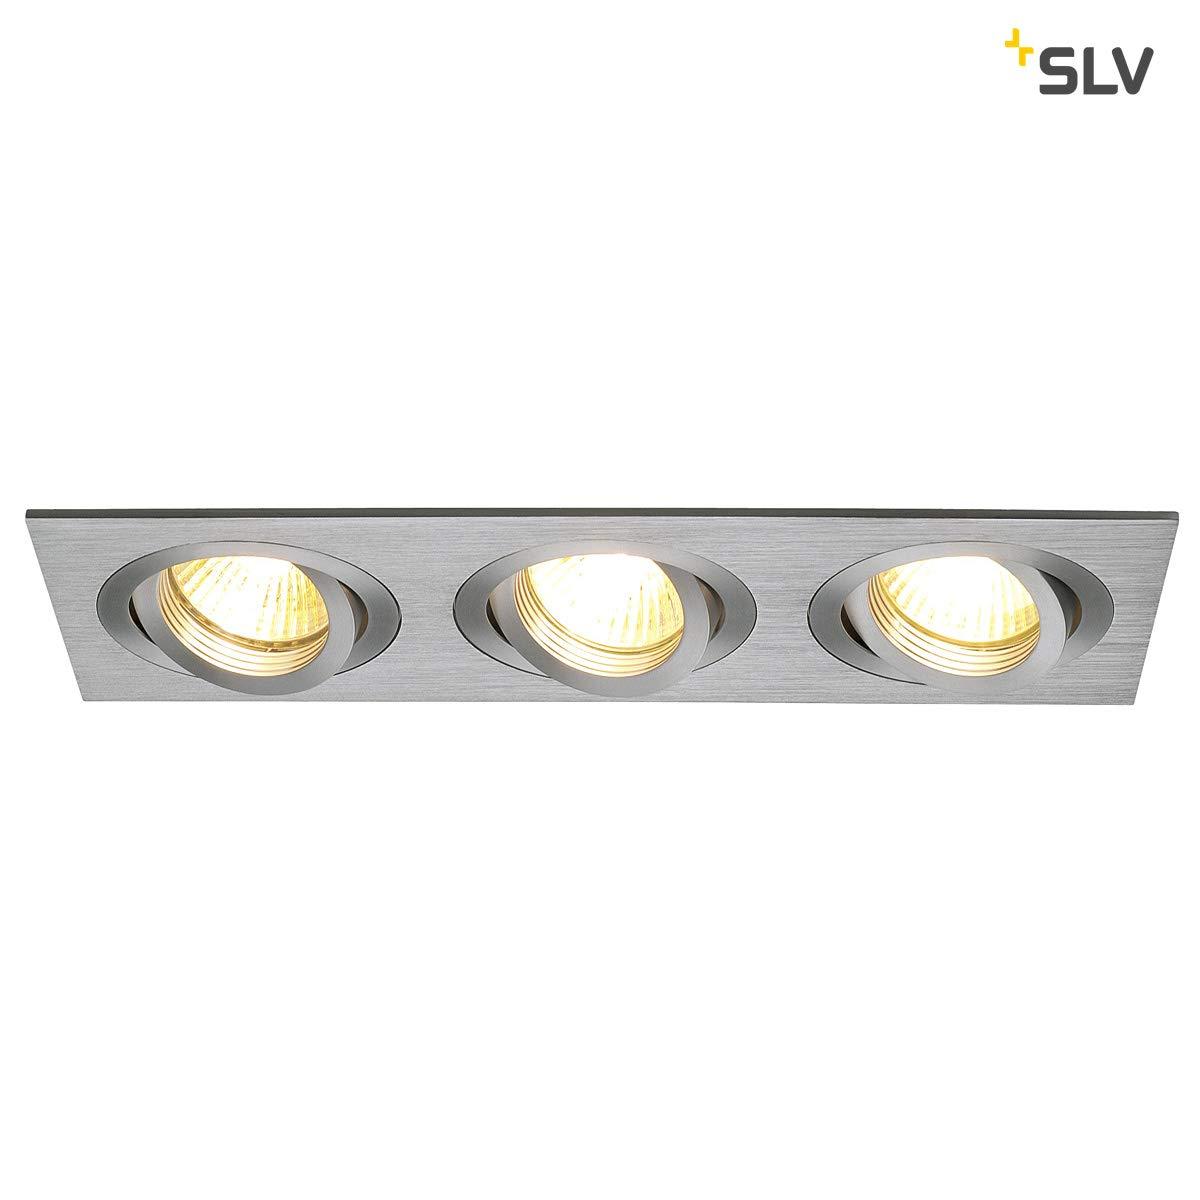 SLV NEW TRIA 3 Leuchte Indoor-Lampe Aluminium Silber Lampe innen, Innen-Lampe